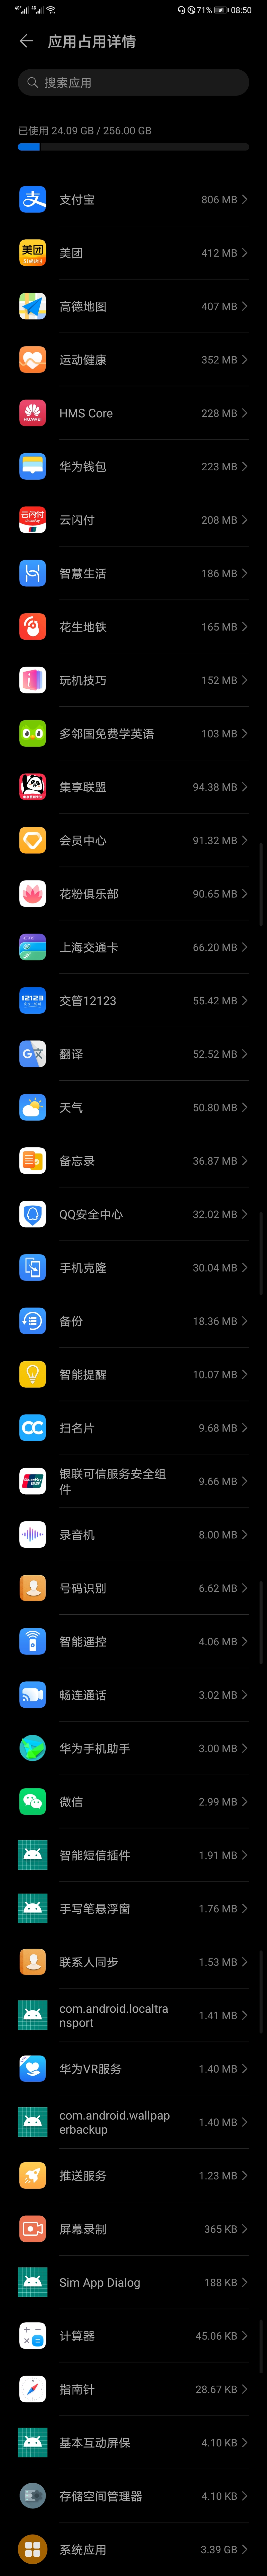 Screenshot_20200508_085024_com.huawei.systemmanager.jpg